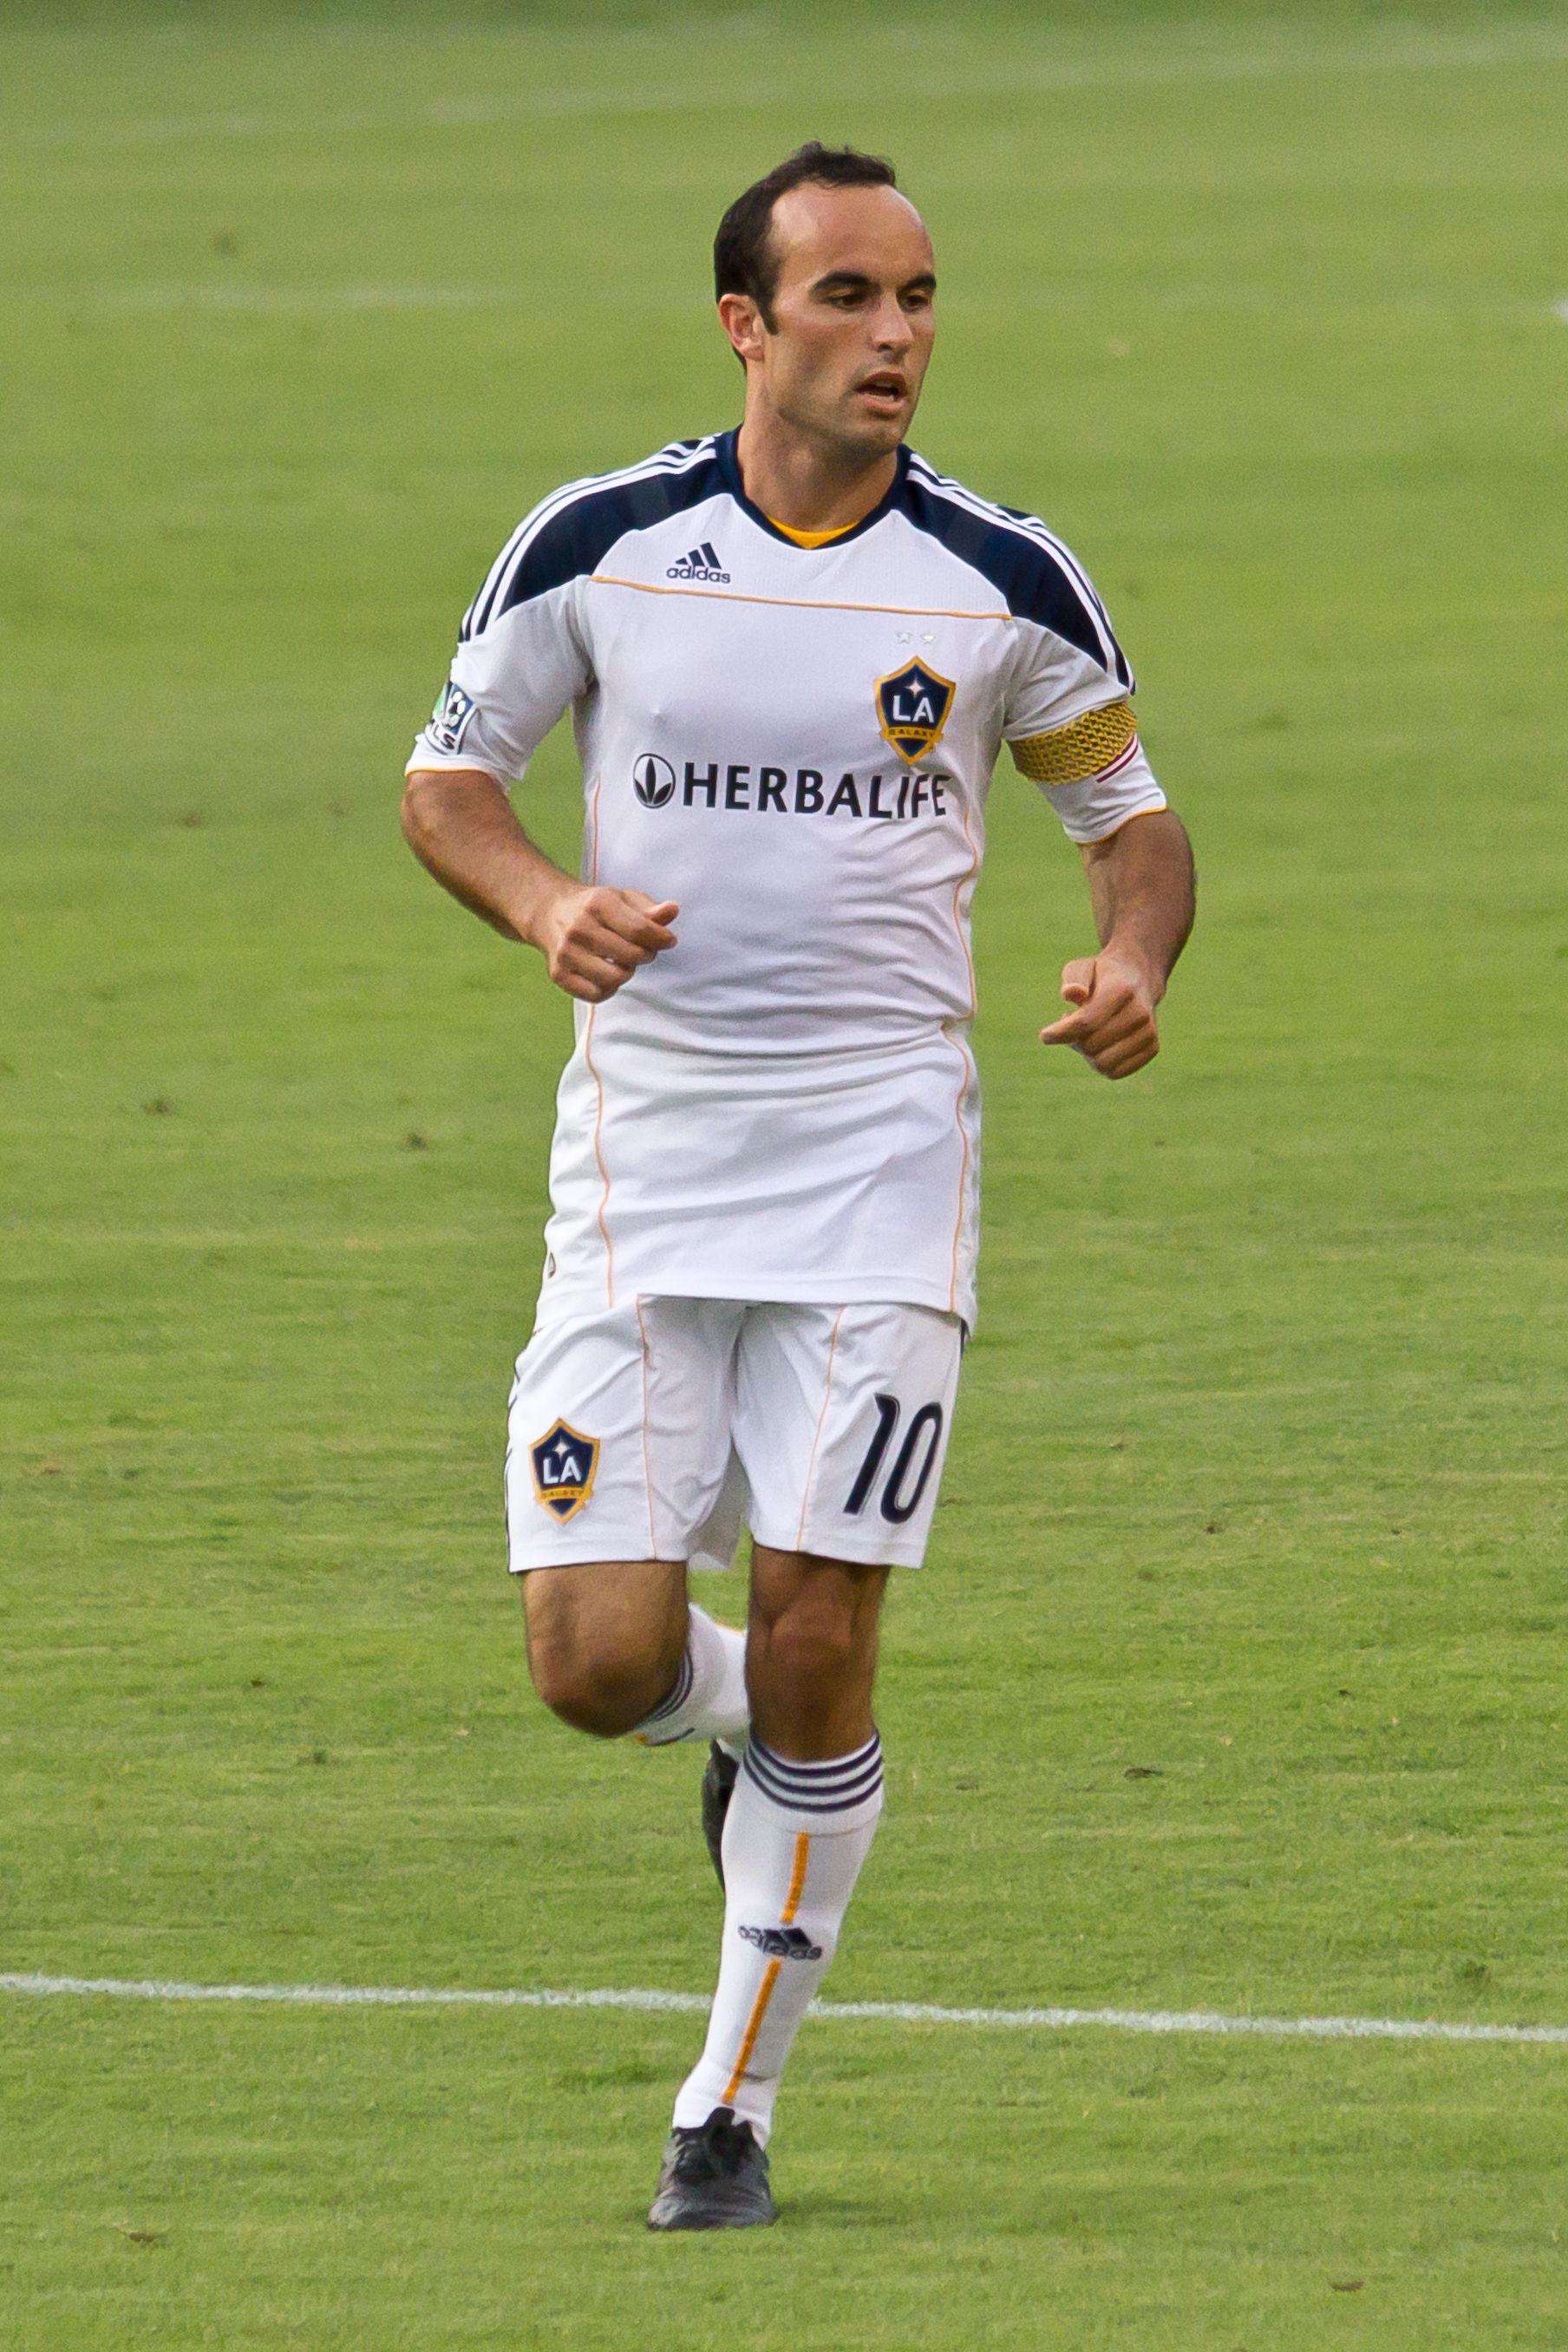 Photo of Landon Donovan: American soccer player